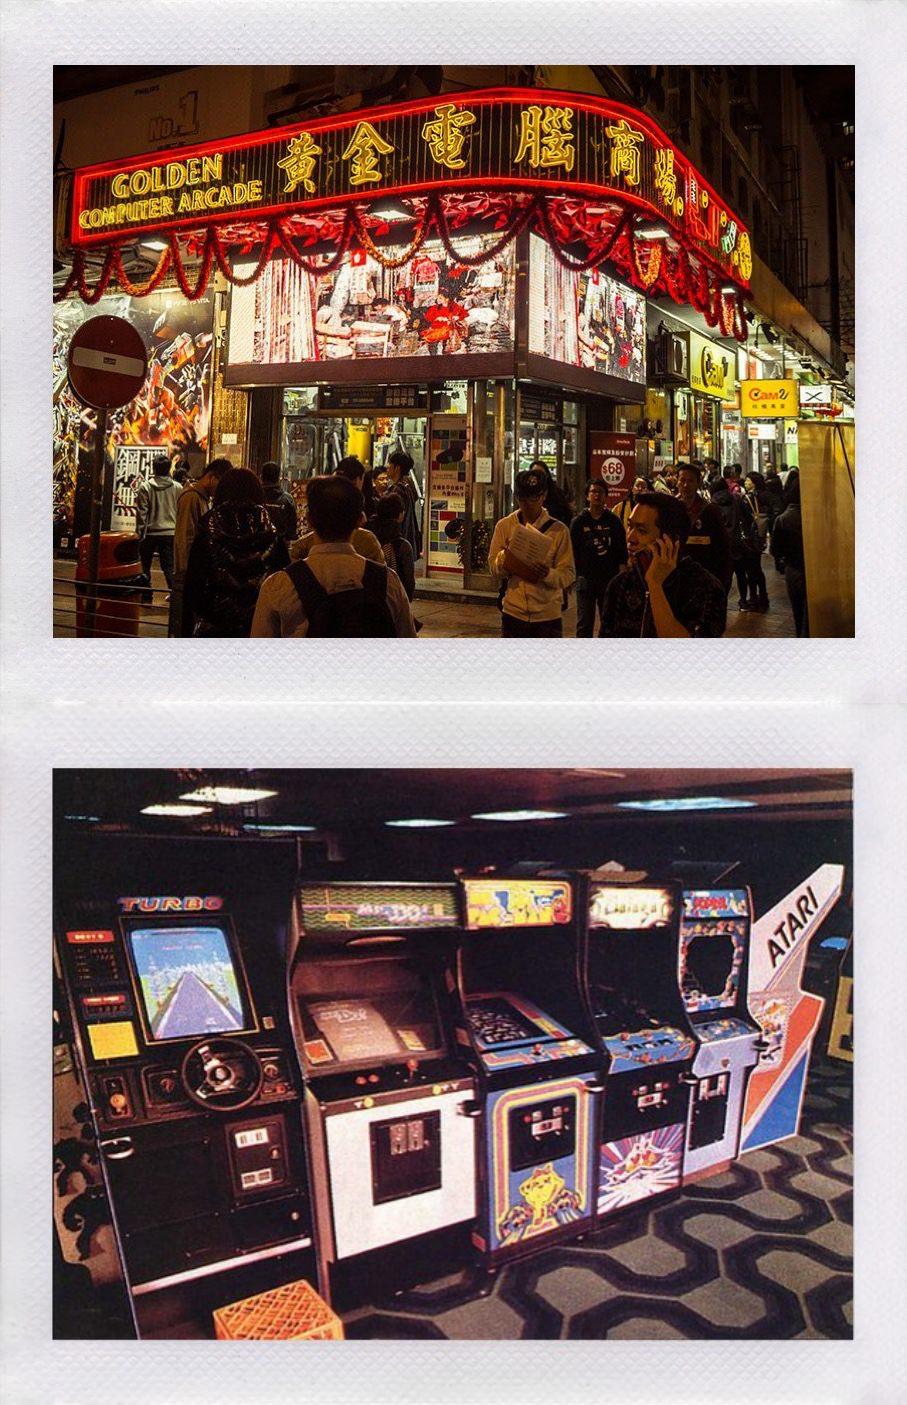 mybelonging-tommylei-walmart-retro-arcade-old-hong-kong-arcades23.jpg